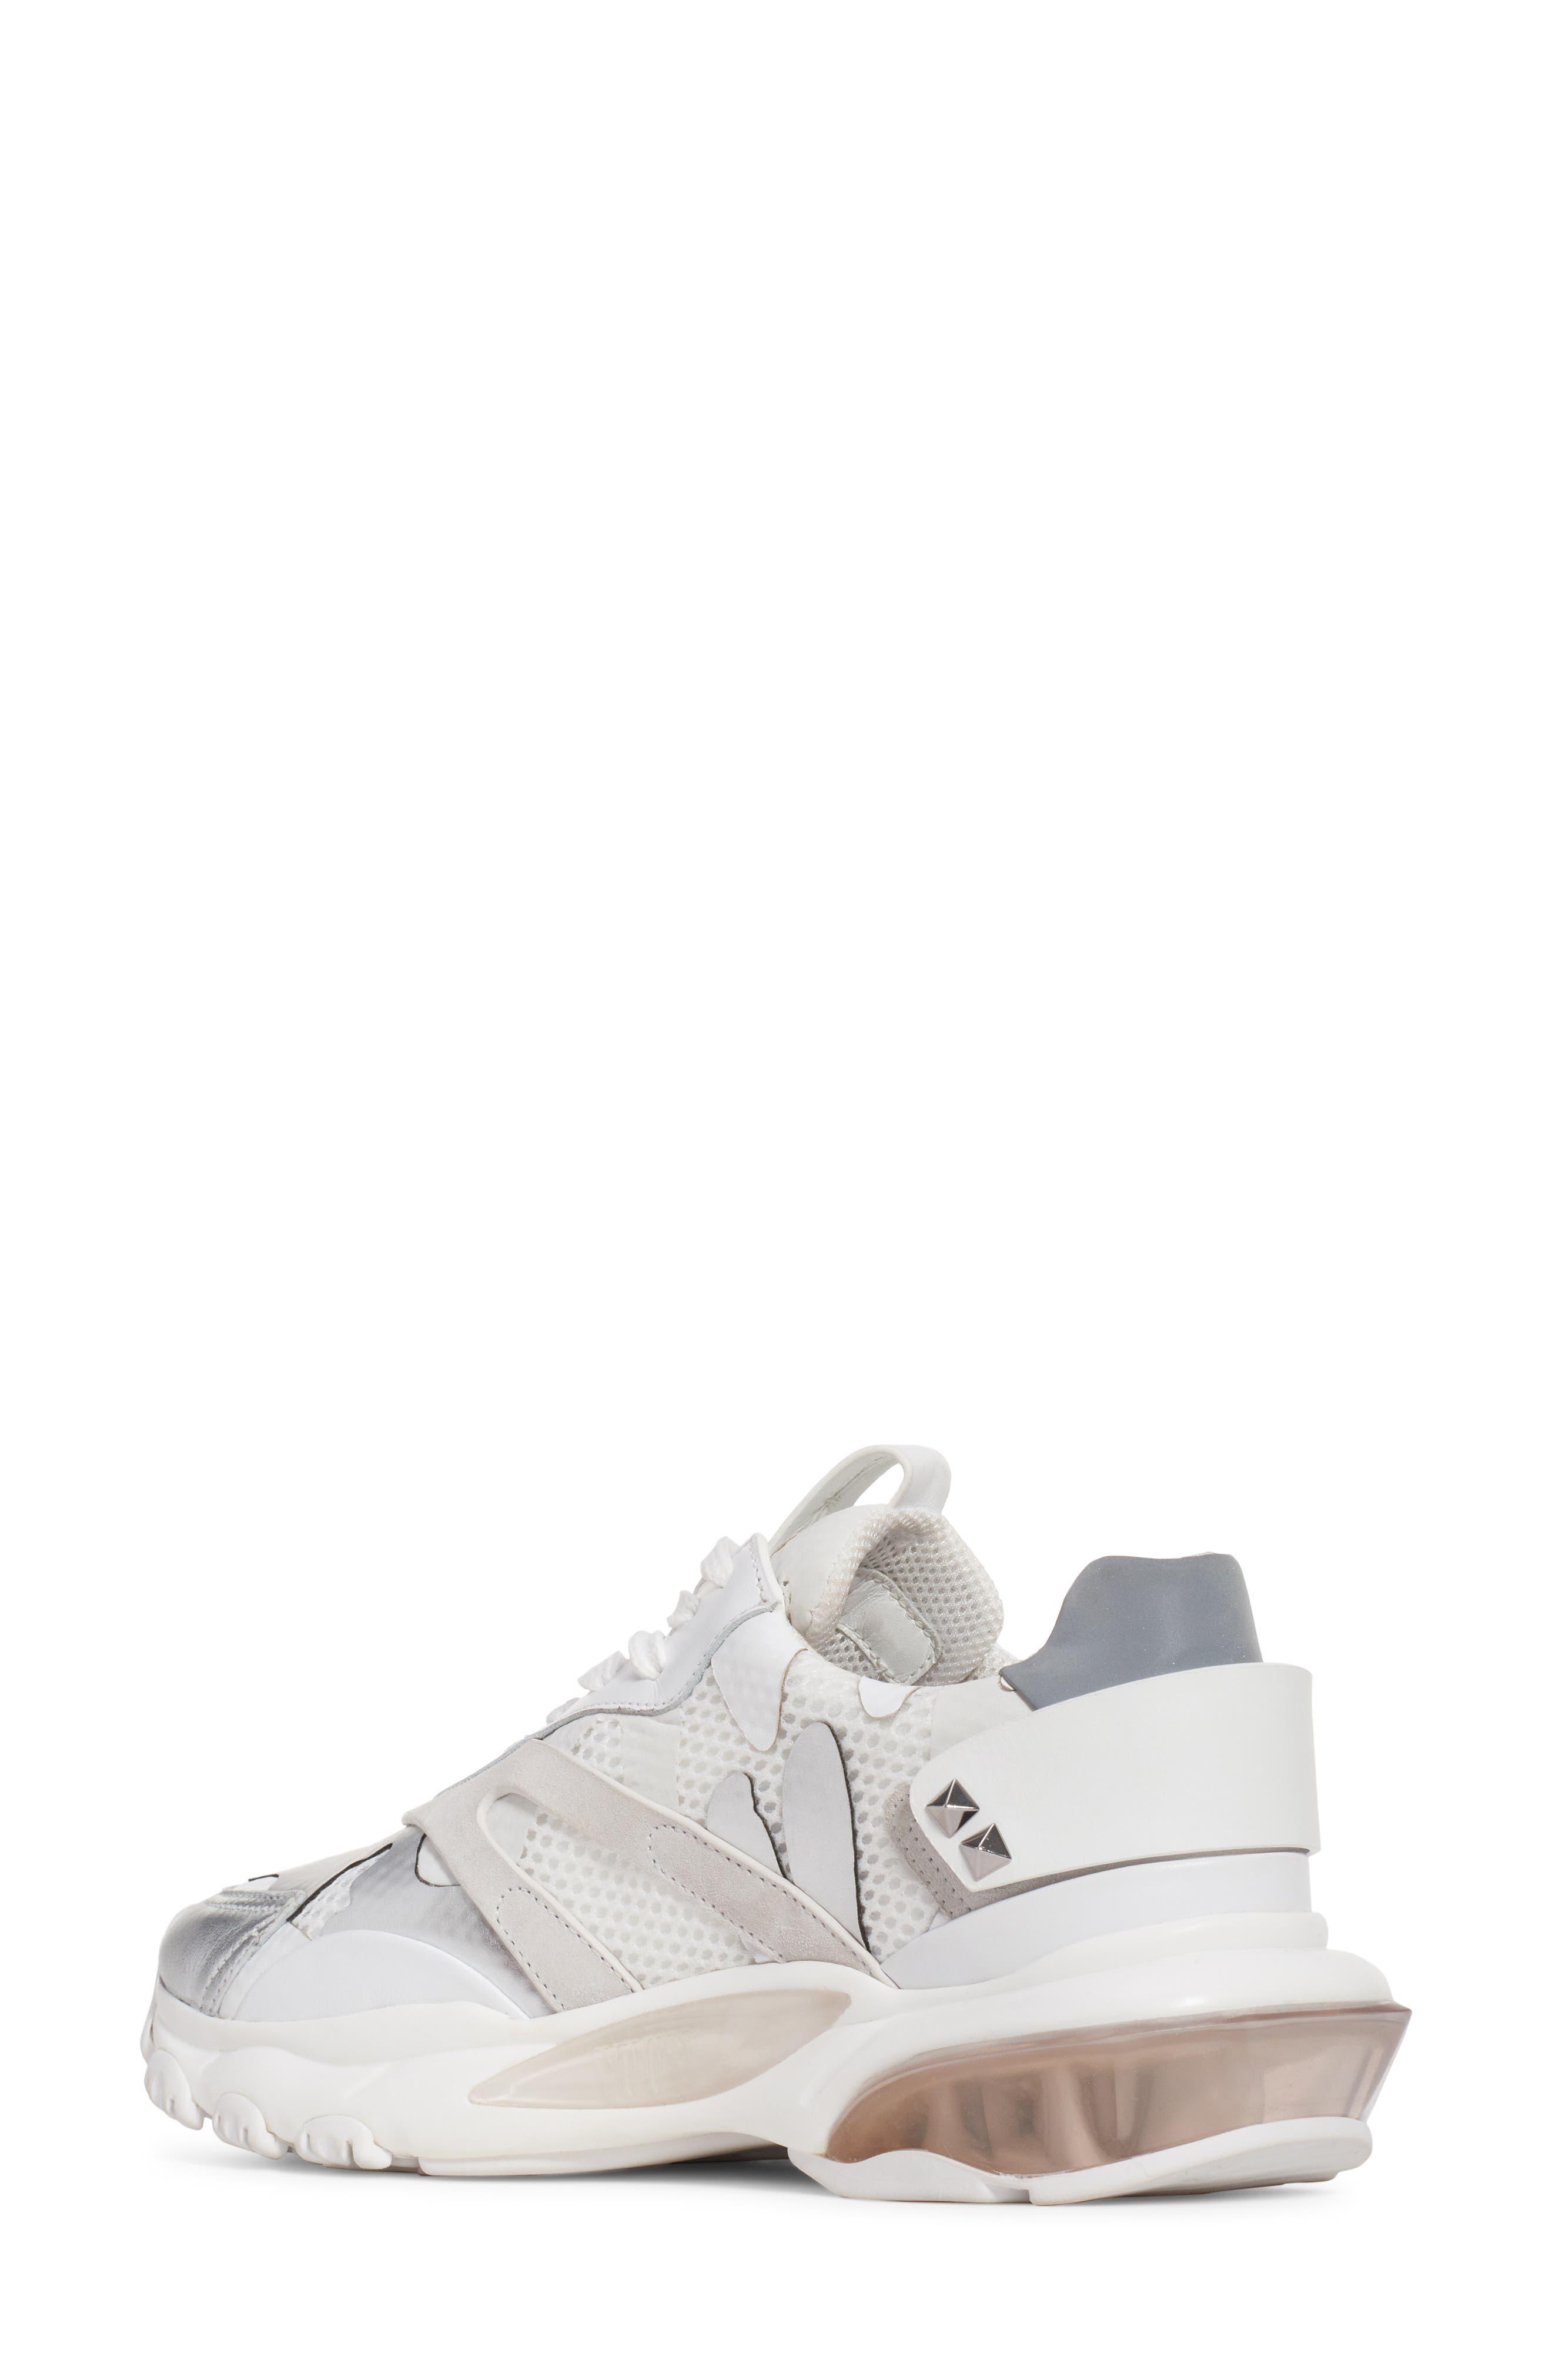 Camo Sneaker,                             Alternate thumbnail 2, color,                             WHITE